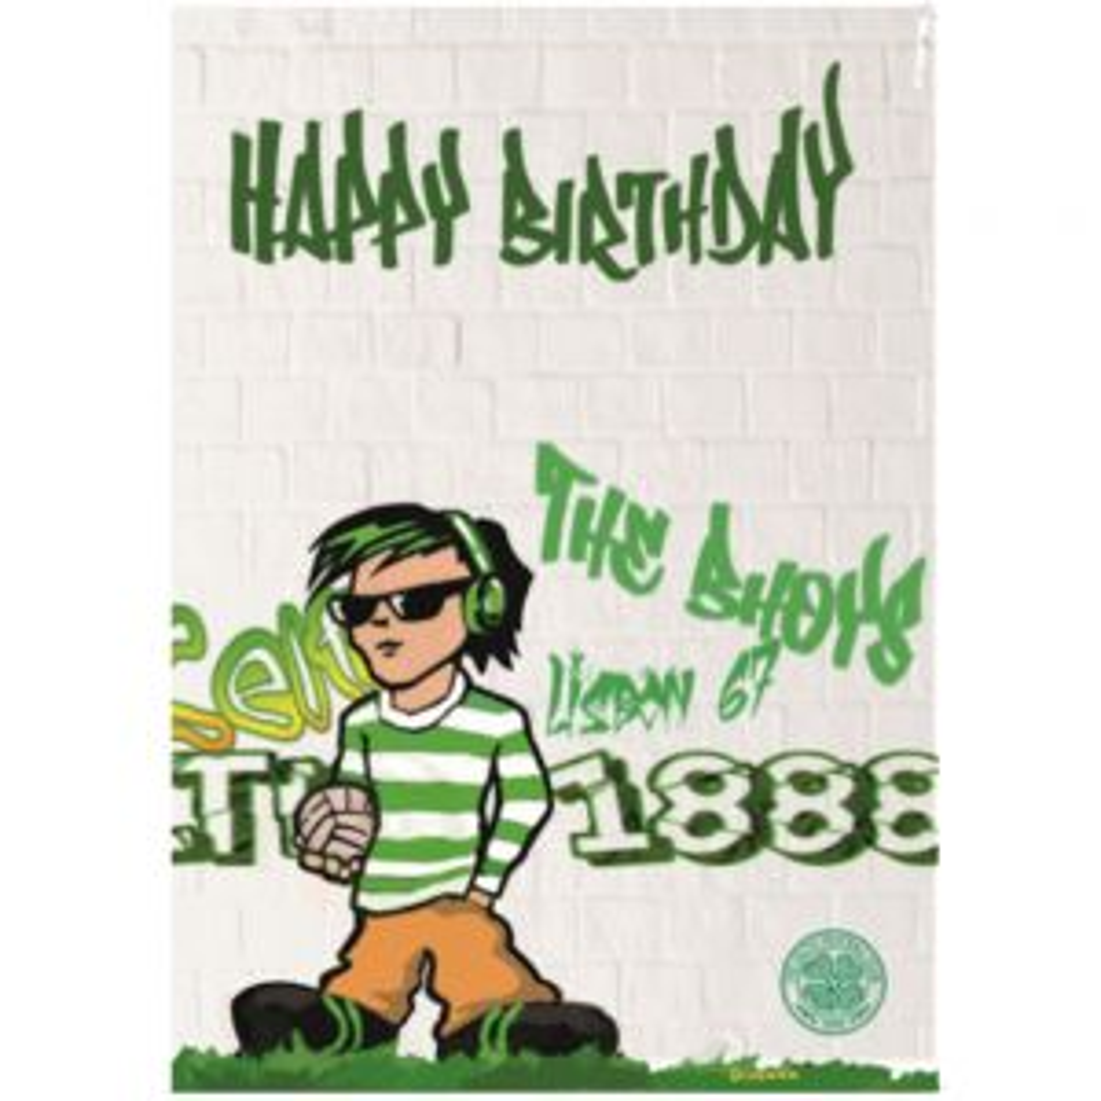 Celtic Graffiti Birthday Card